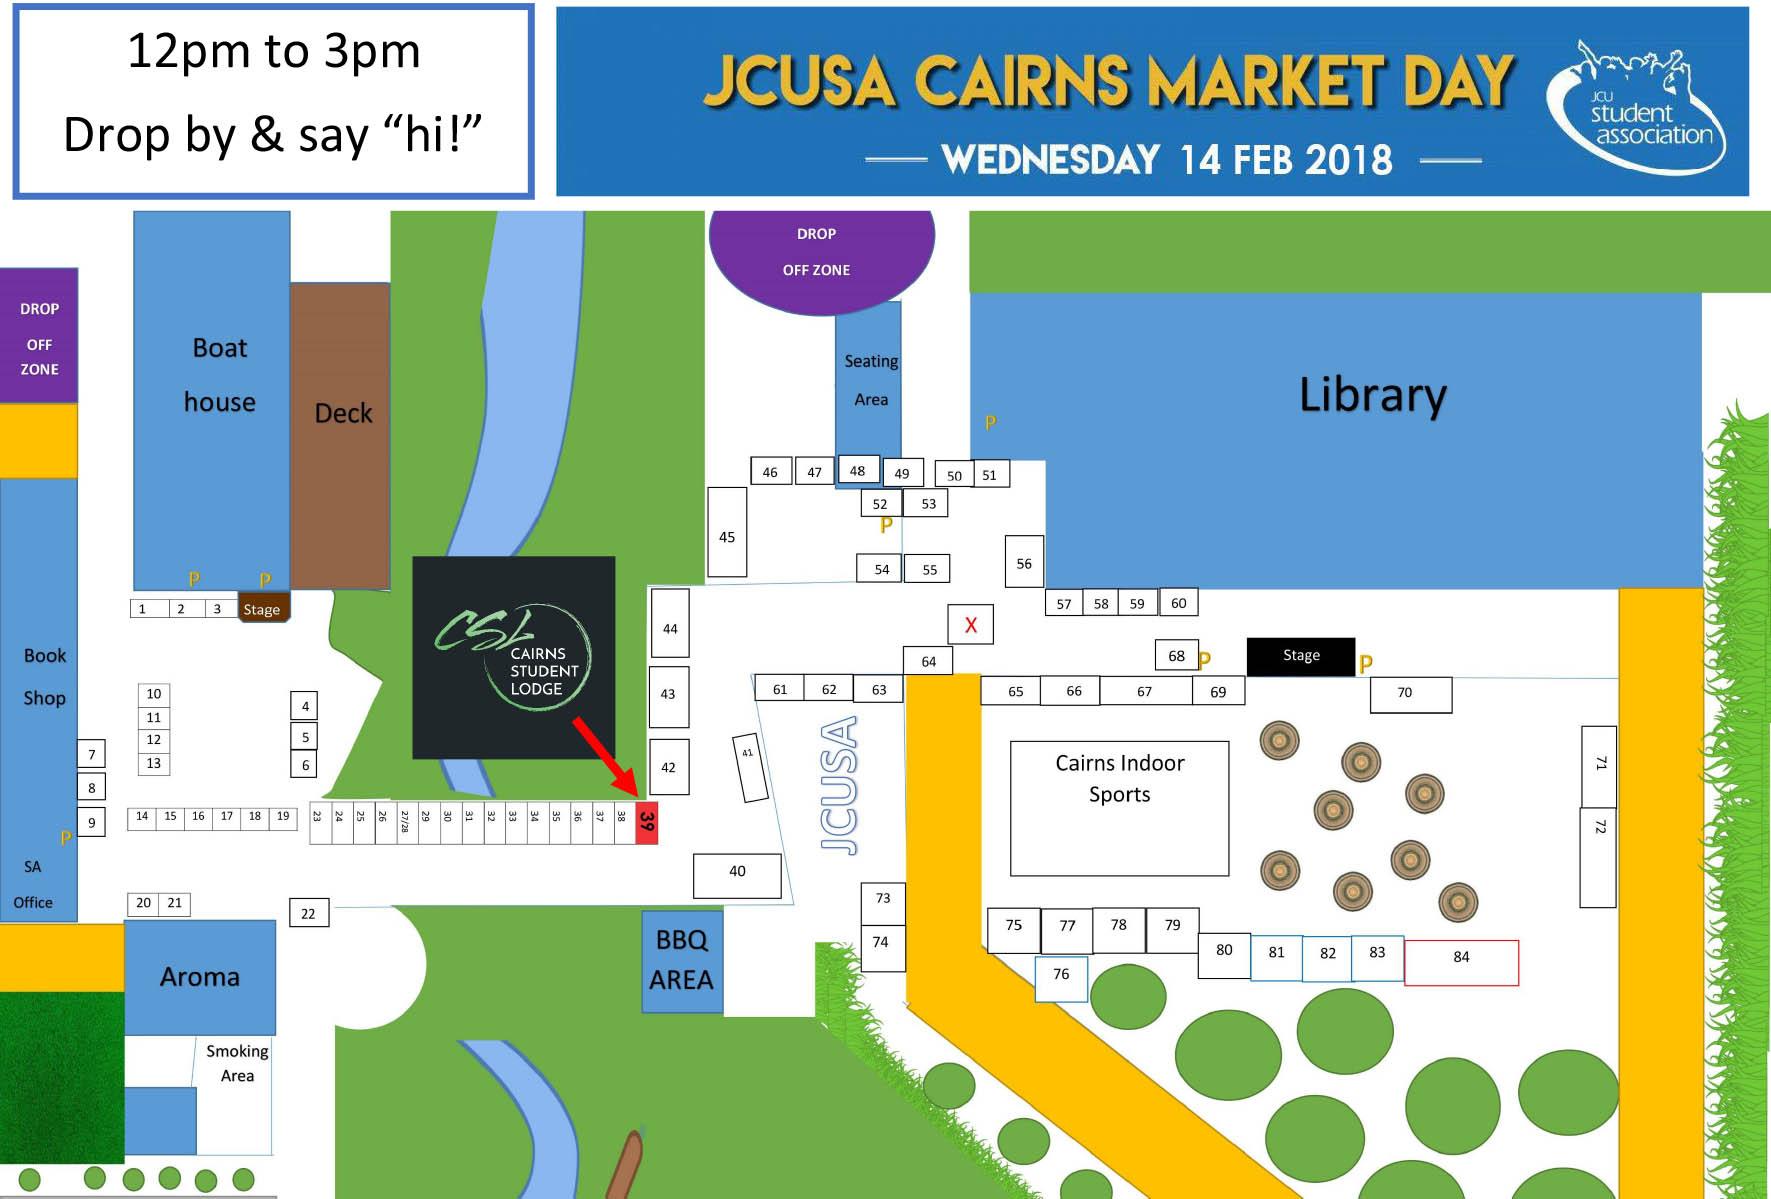 Map - Market Day 2018 JCUSA